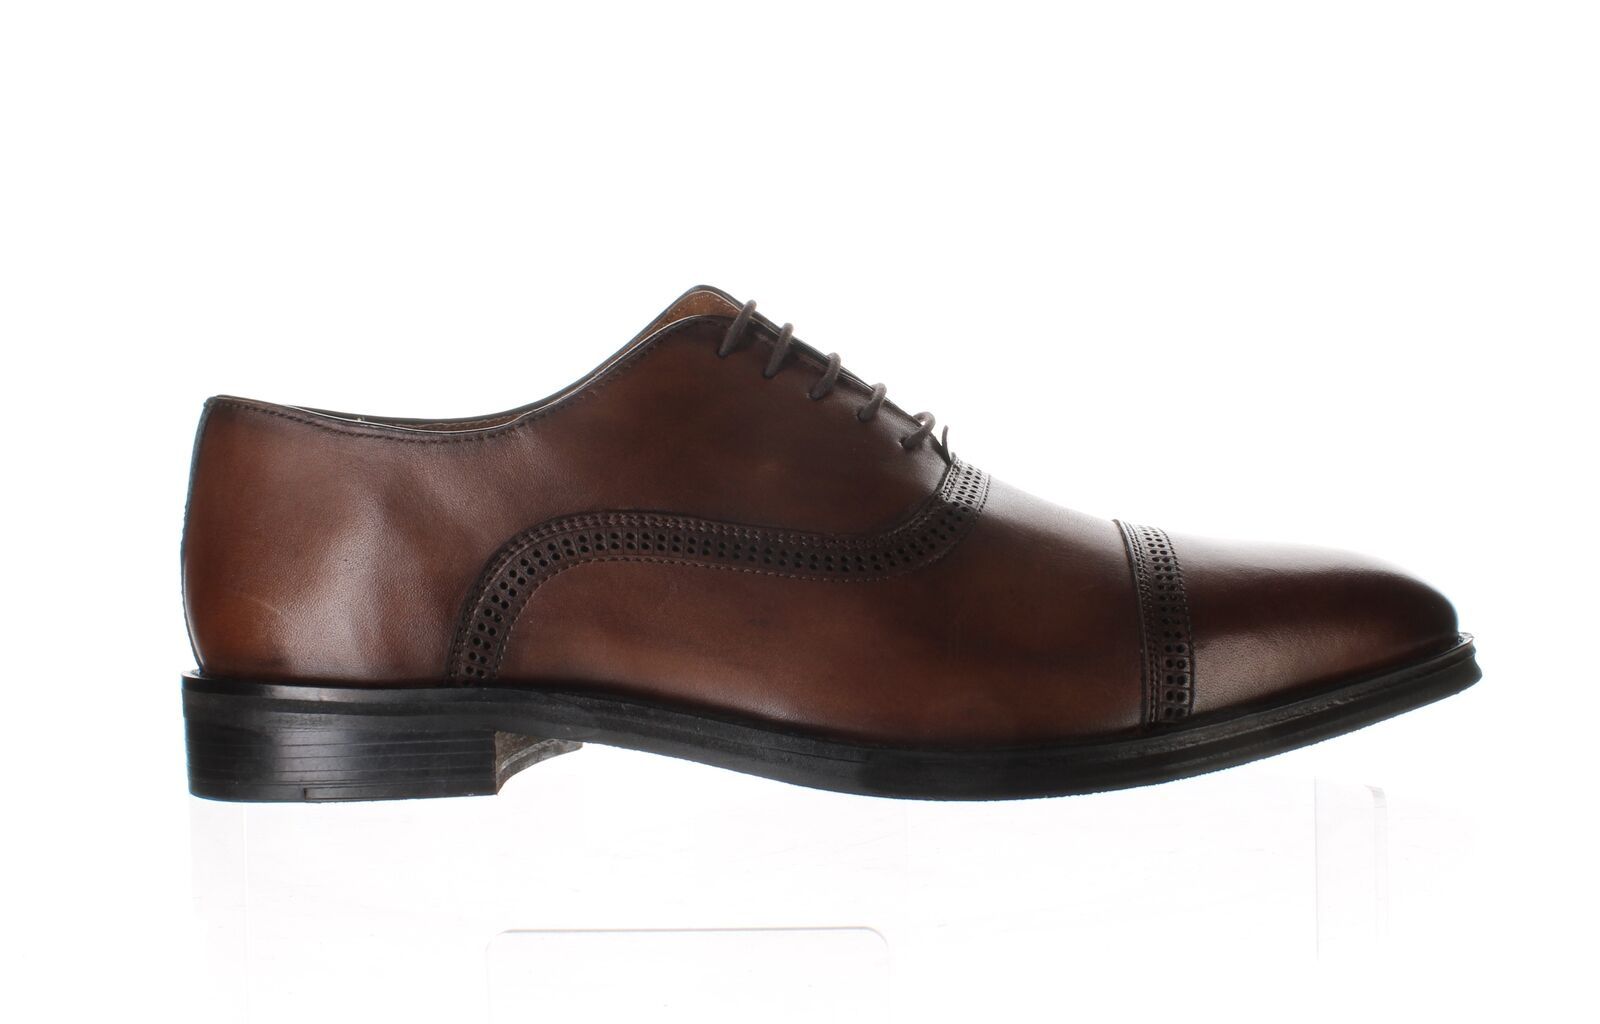 Kenneth Cole Mens Progress Cognac Oxford Dress Shoe Size 13 (1396036)